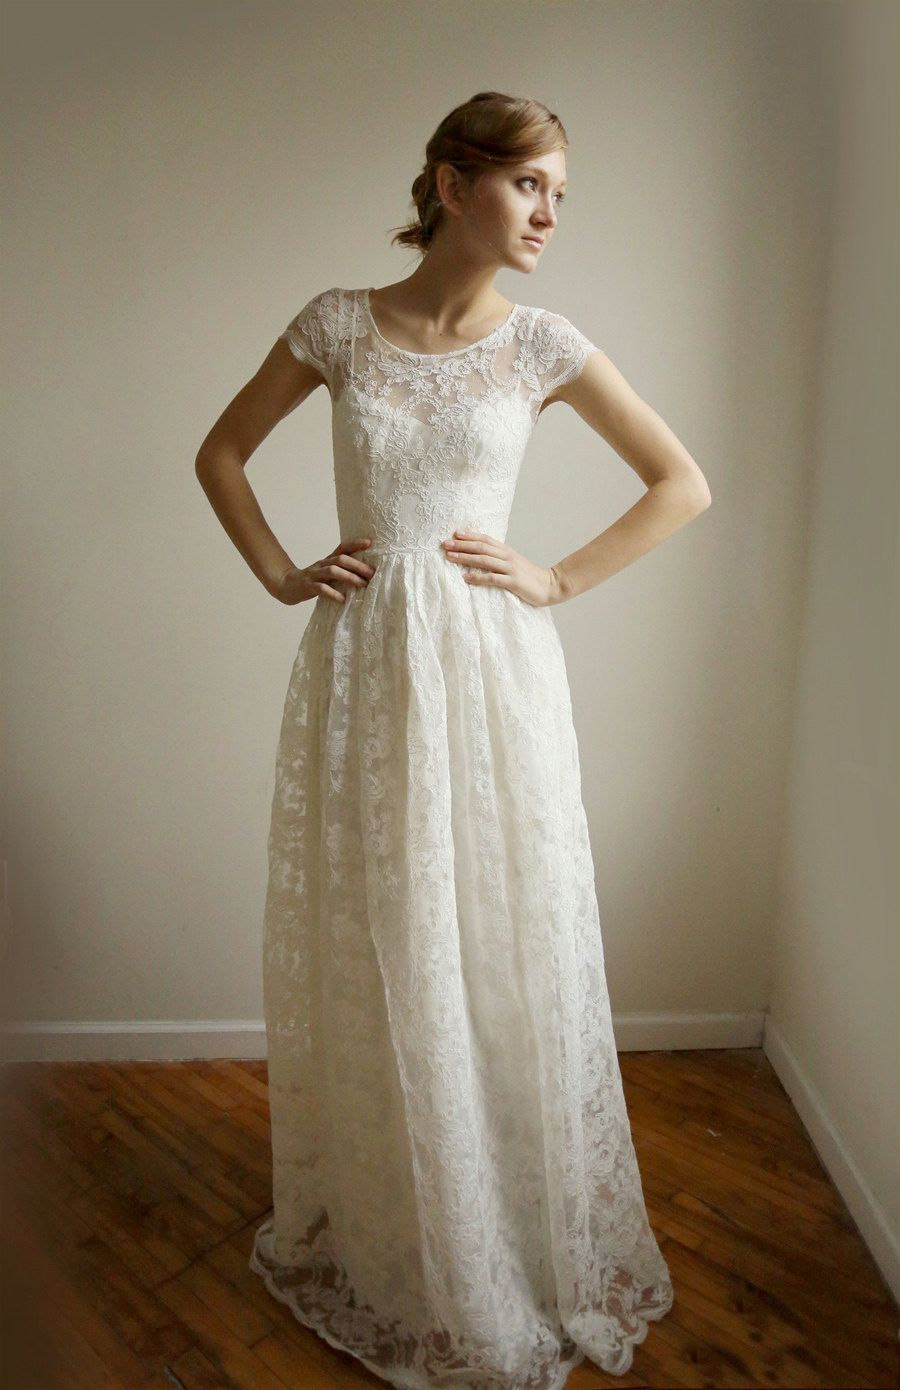 Cotton Wedding Dresses Long 2 Piece Lace And Cotton Wedding Dress Reserved For Kather Cotton Wedding Dresses Online Wedding Dress Wedding Dresses Lace